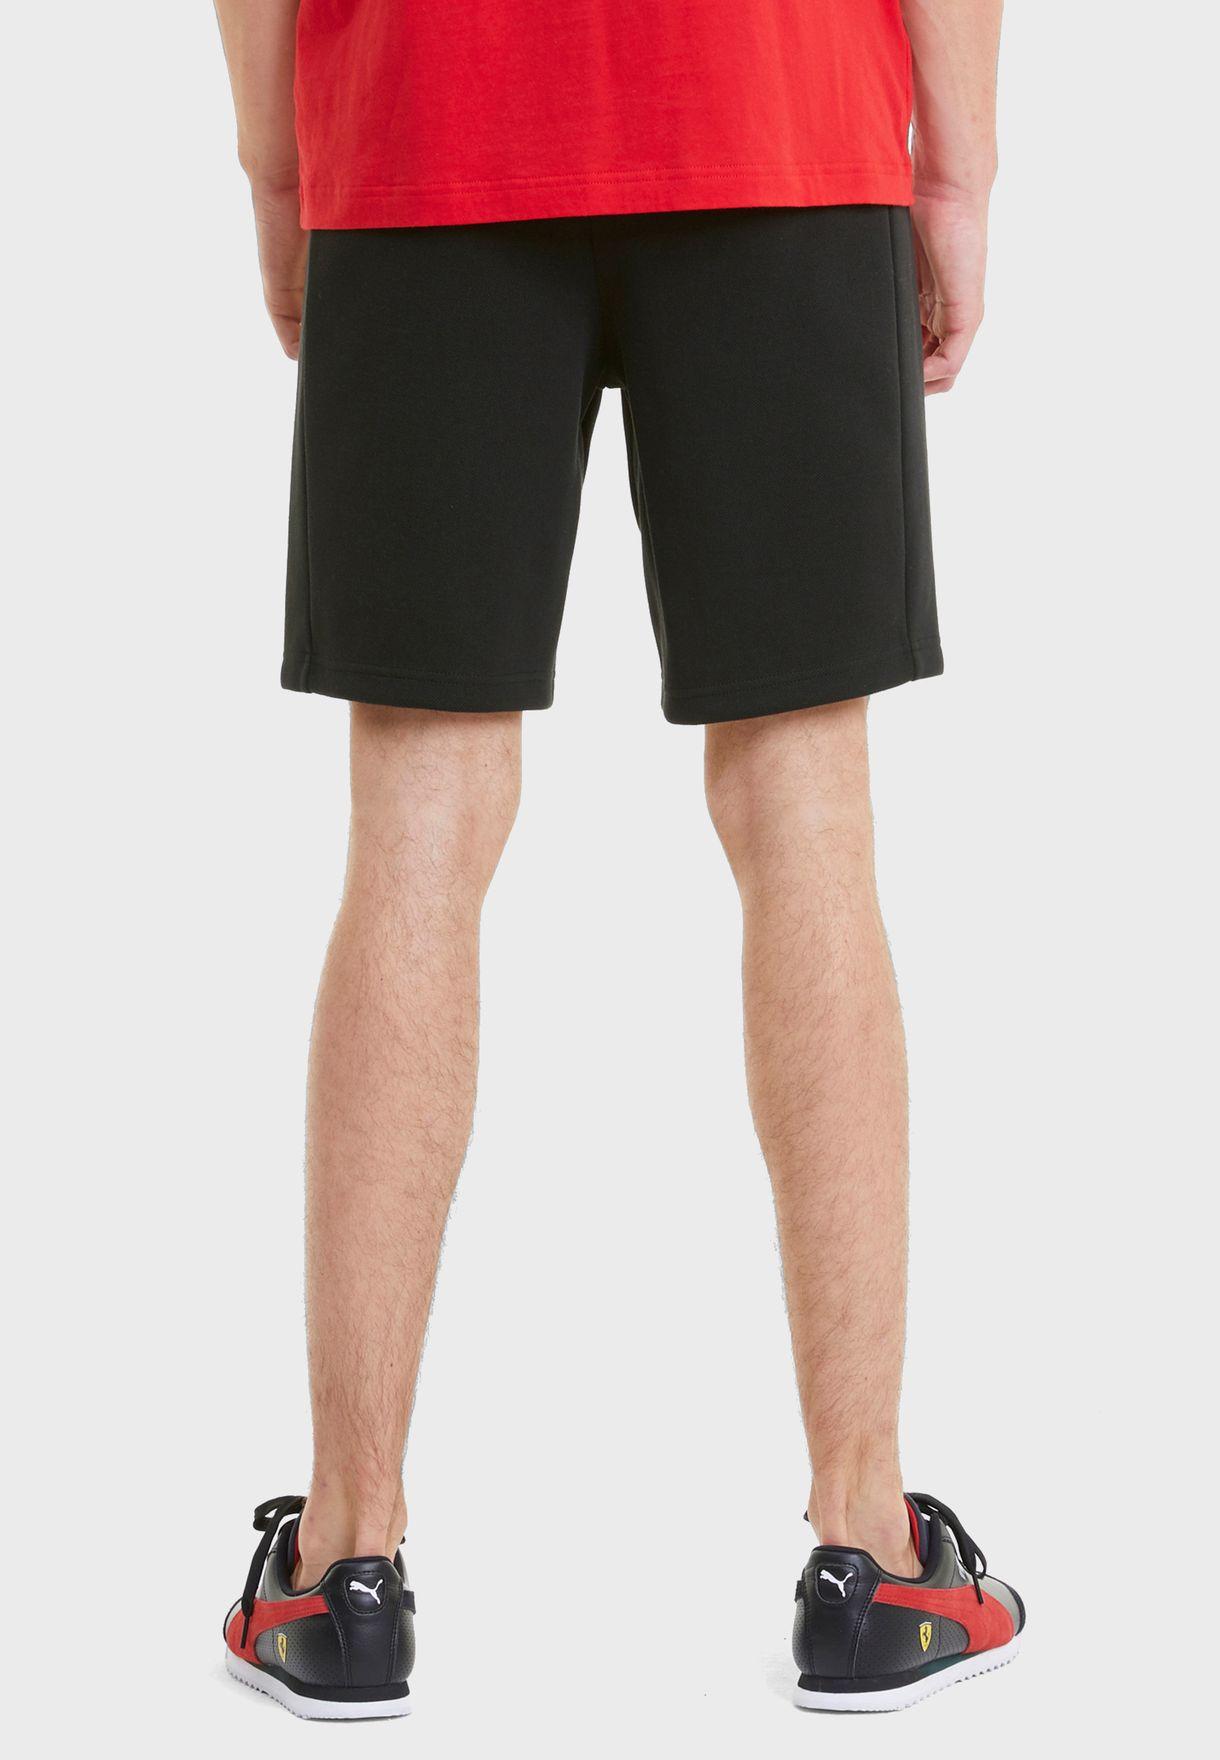 Ferrari Style Shorts